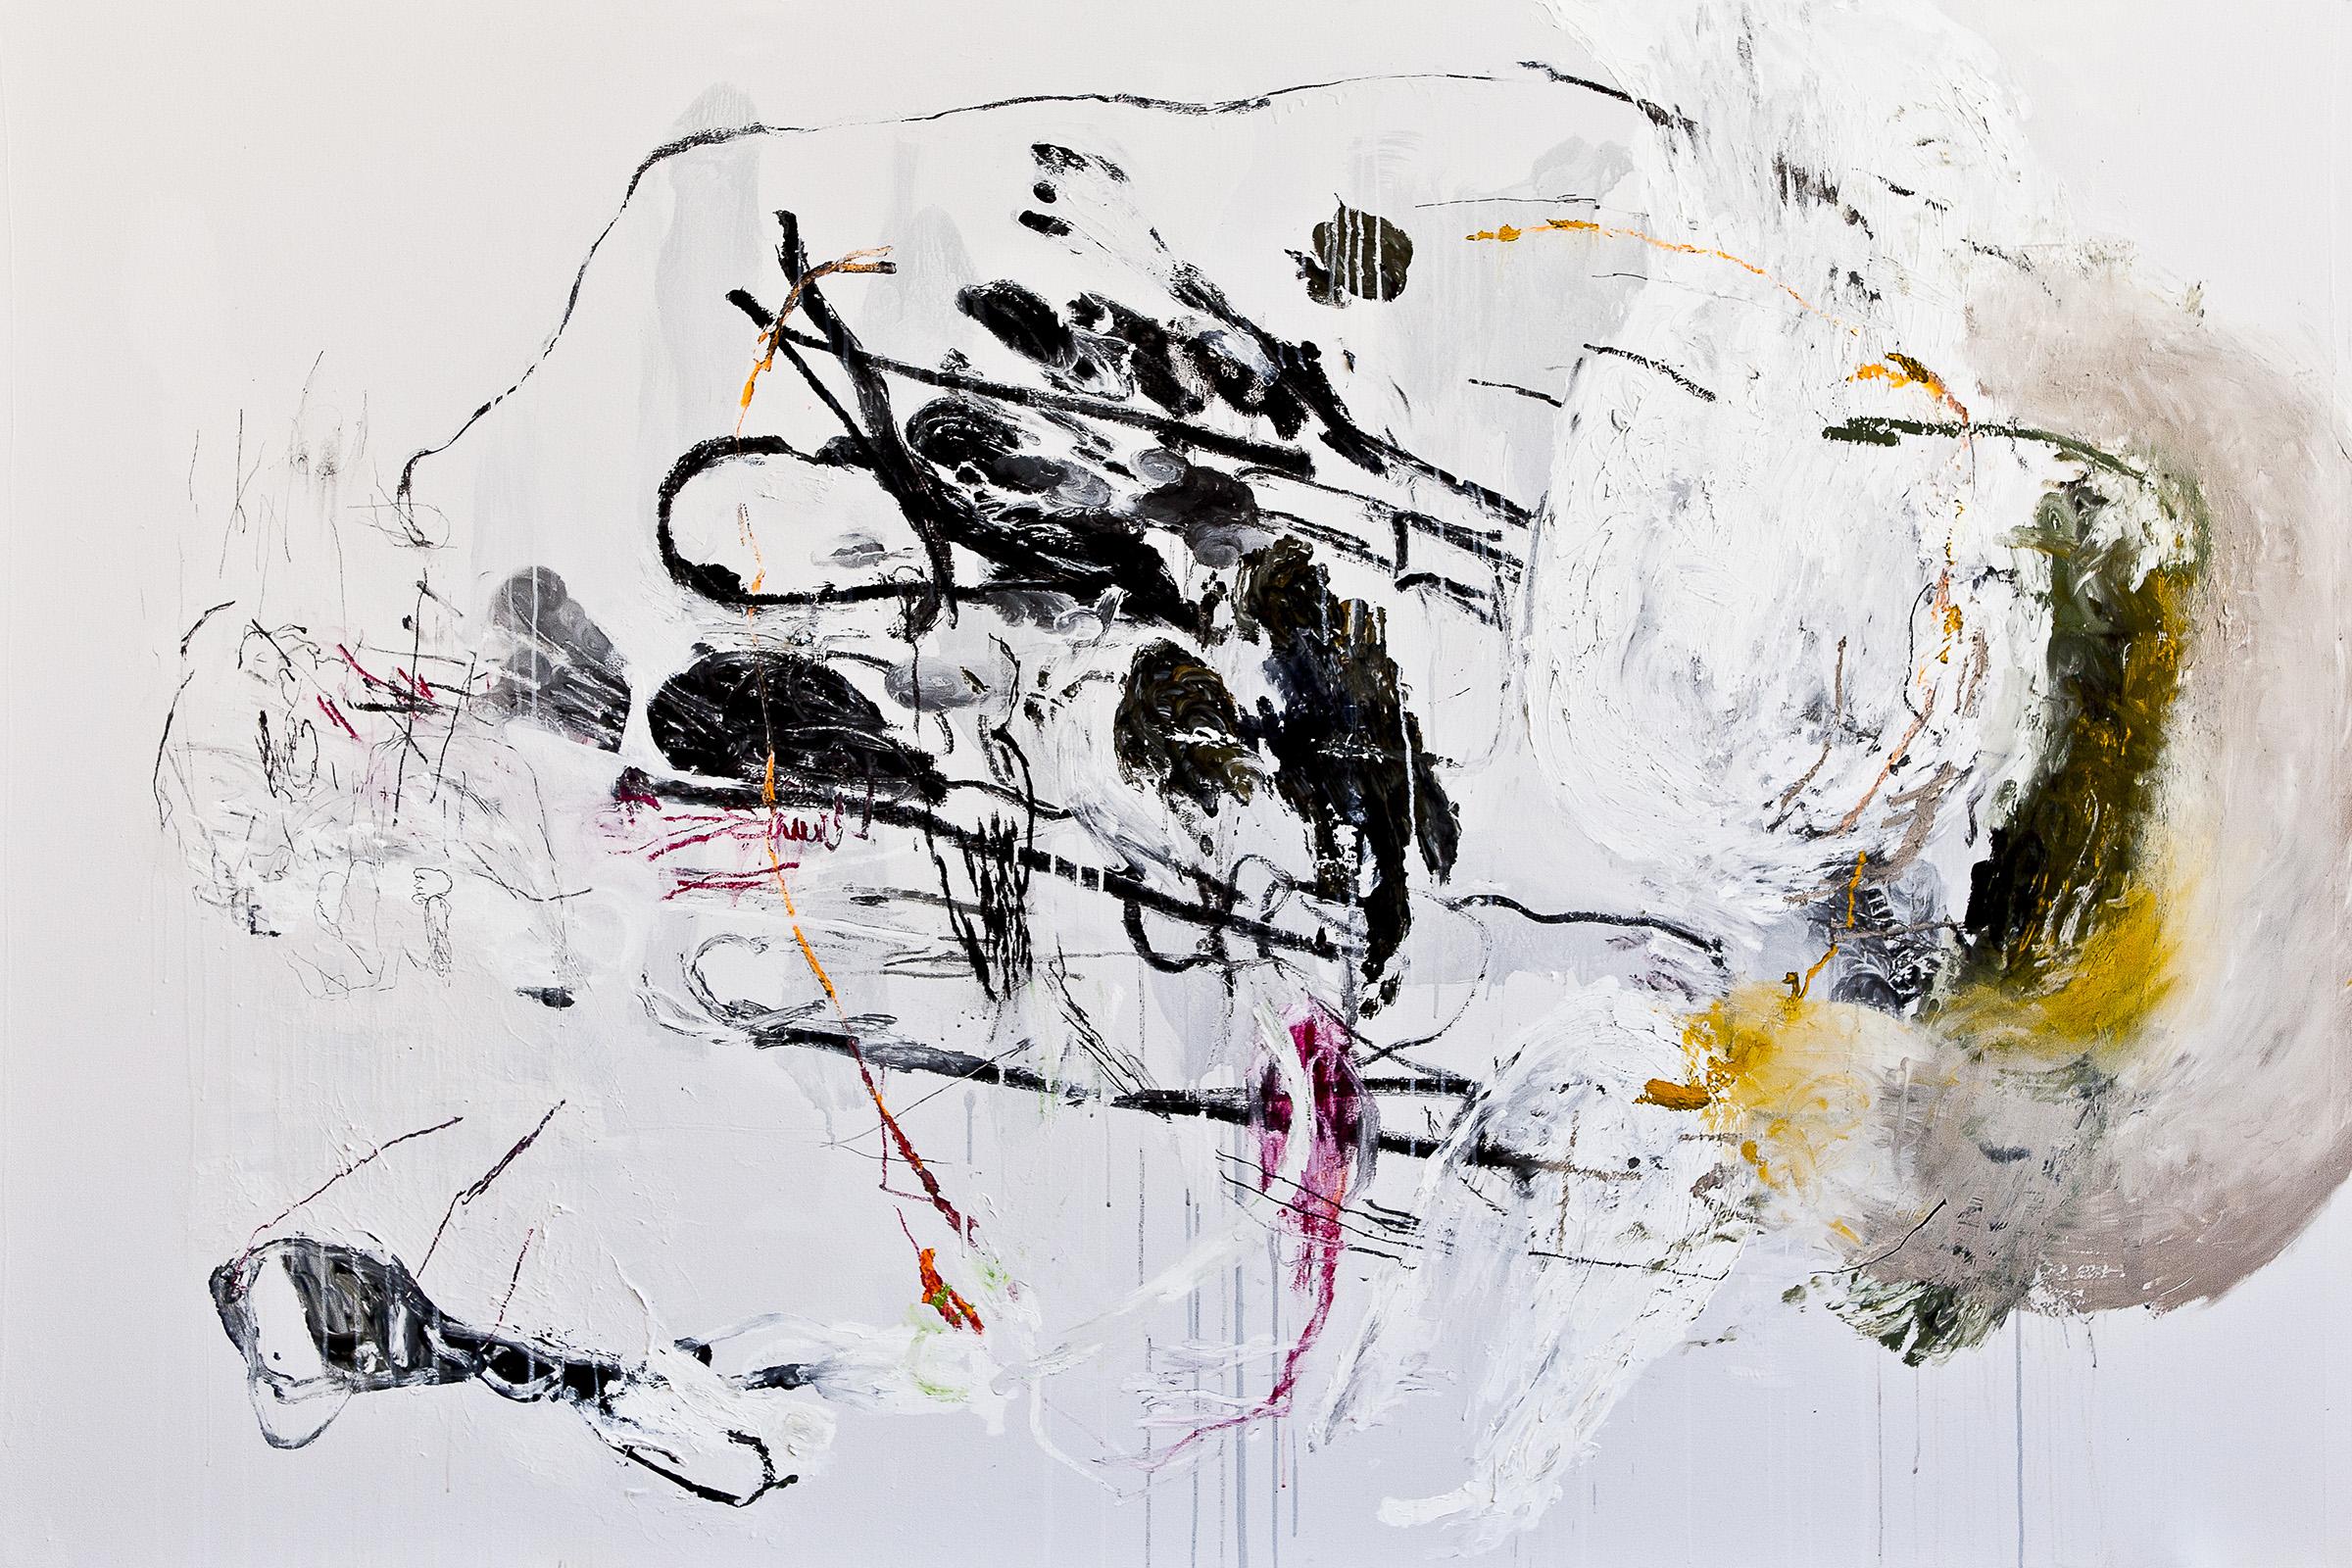 Tim Hussey, Bathos 53, oil, mixed media on canvas